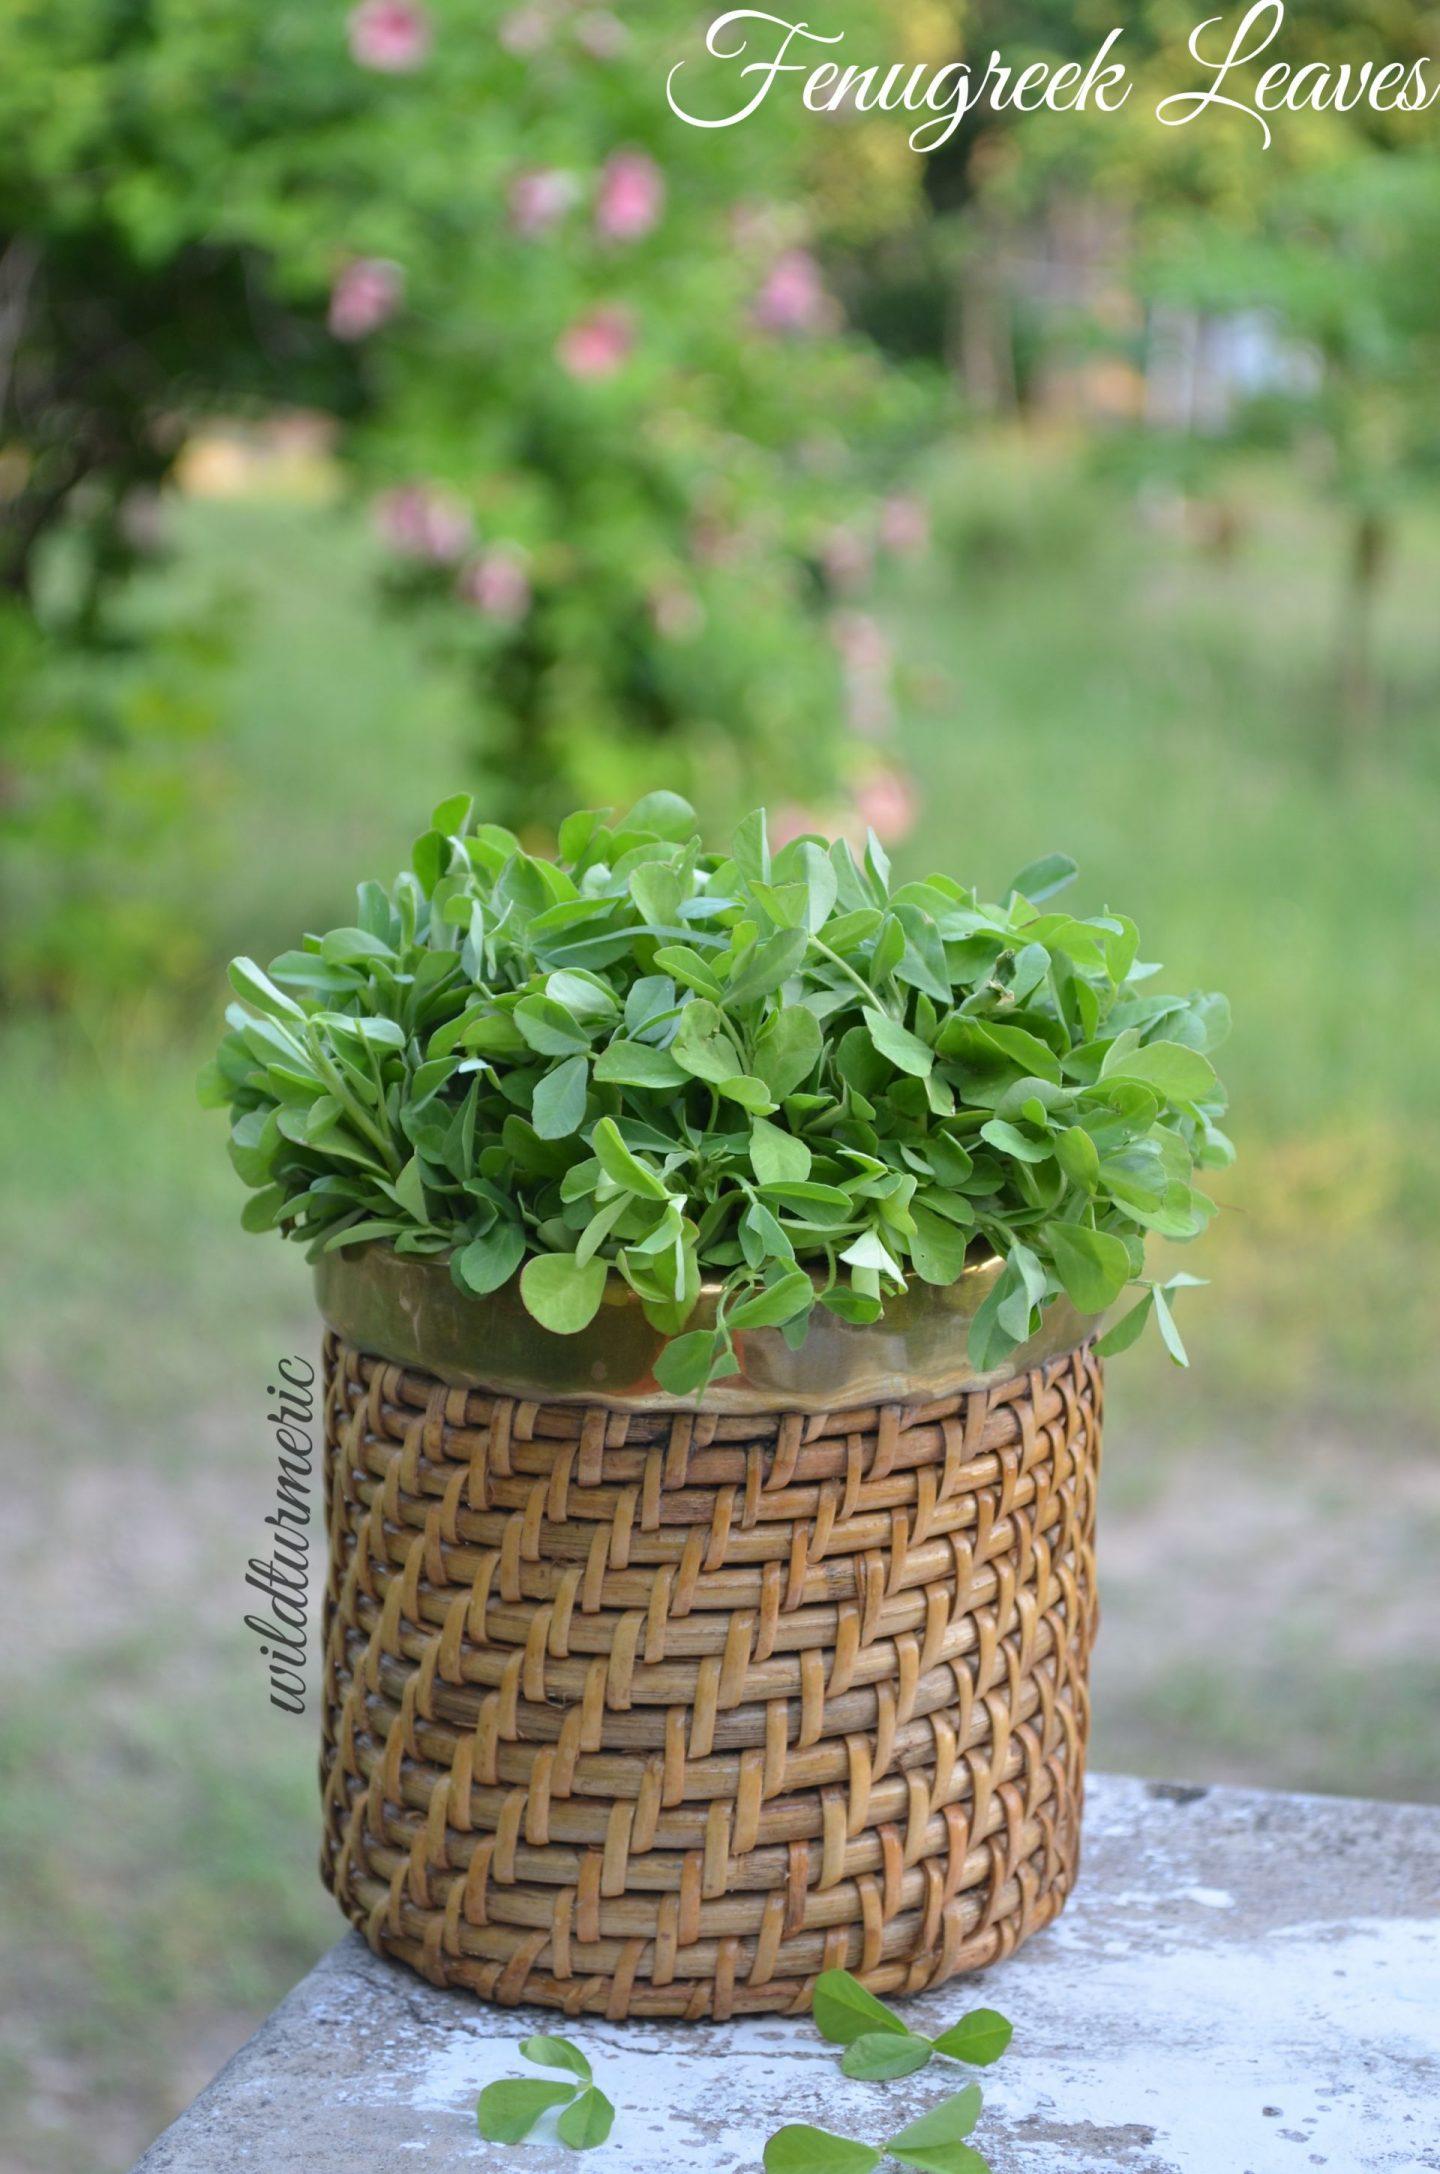 methi leaves benefits